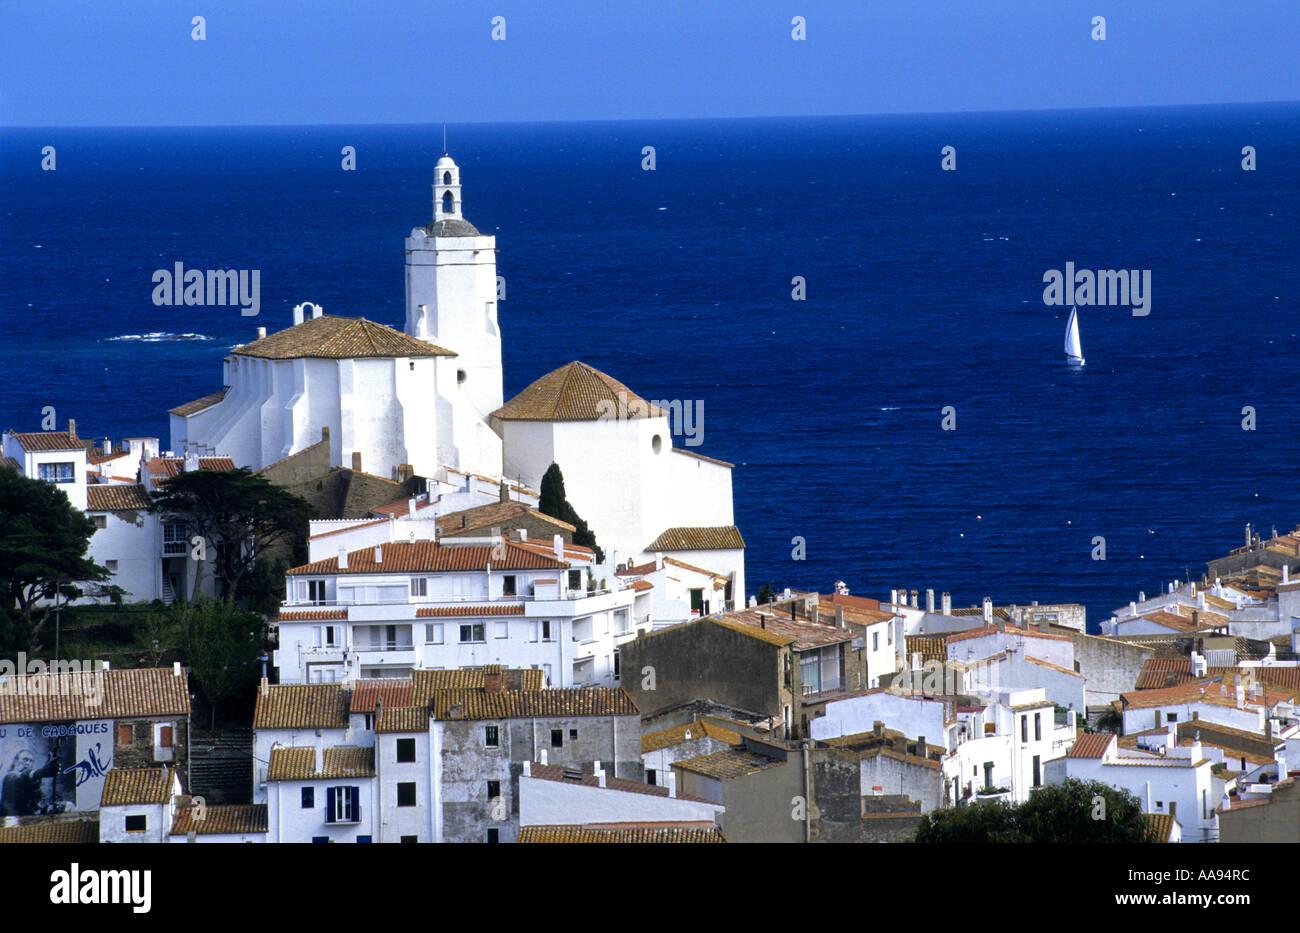 Cadaques Costa Brava Catalonia Spanien Stockbild